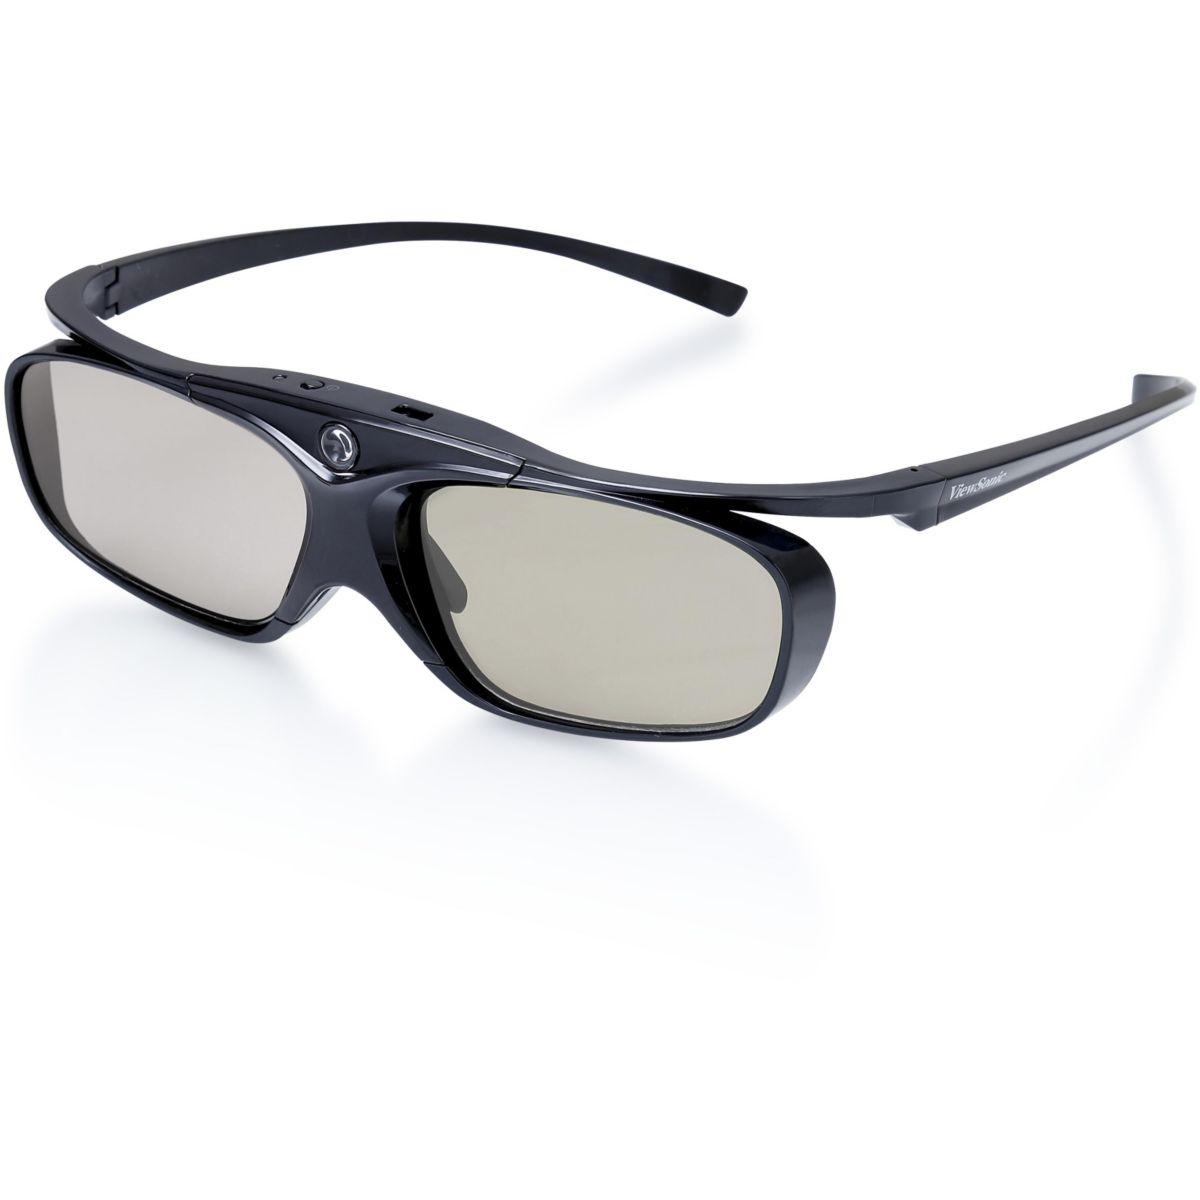 Accessoire VIEWSONIC PGD-350